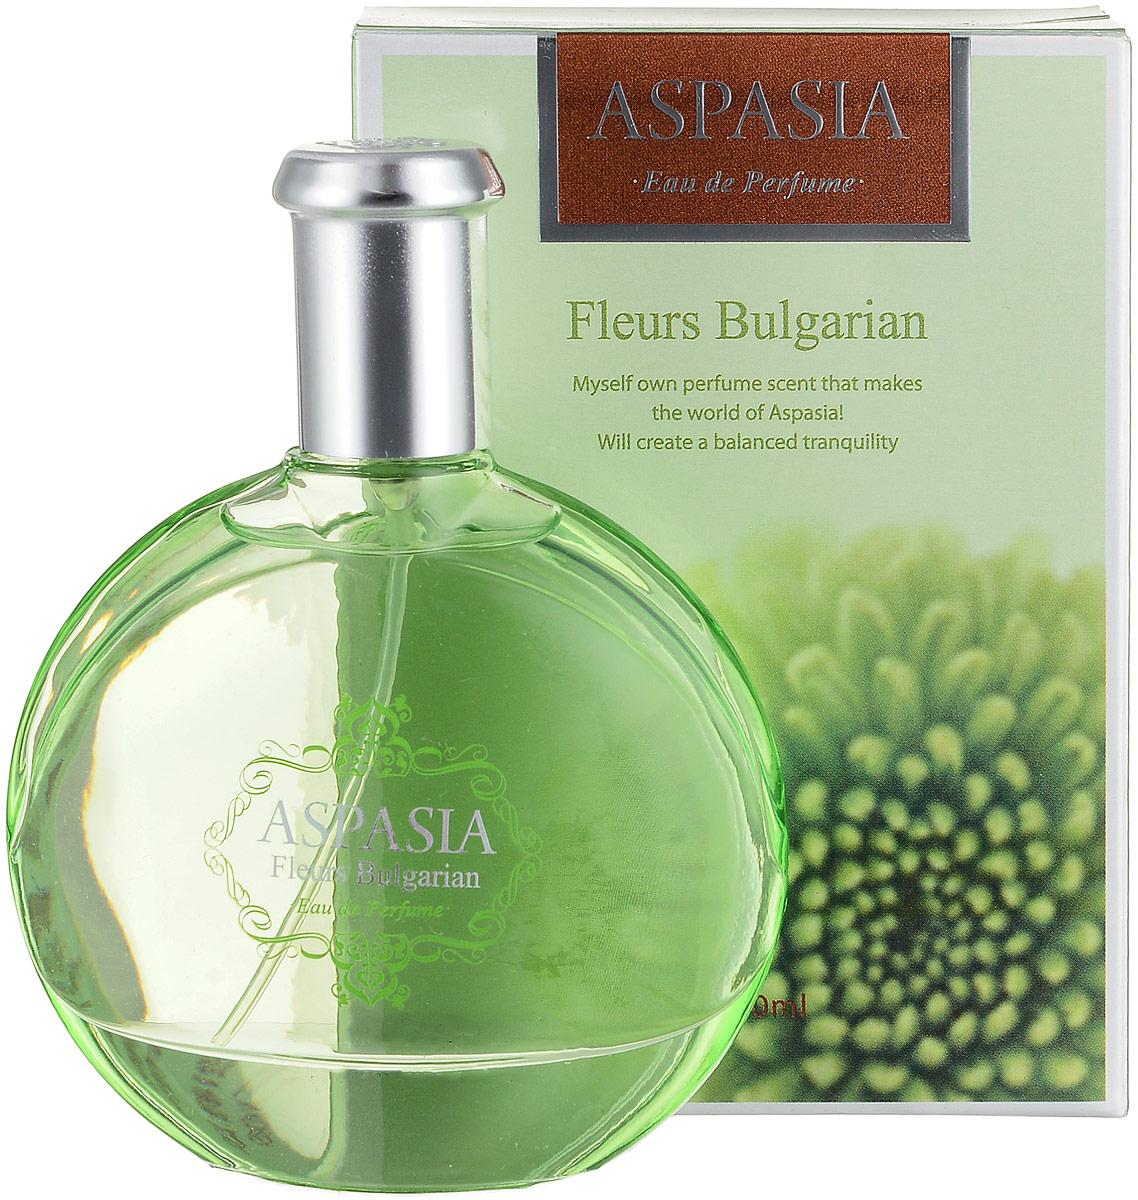 Aspasia туалетная вода, женская Eu de parfume Fleurs Bulgarian, 50 мл - Парфюмерия